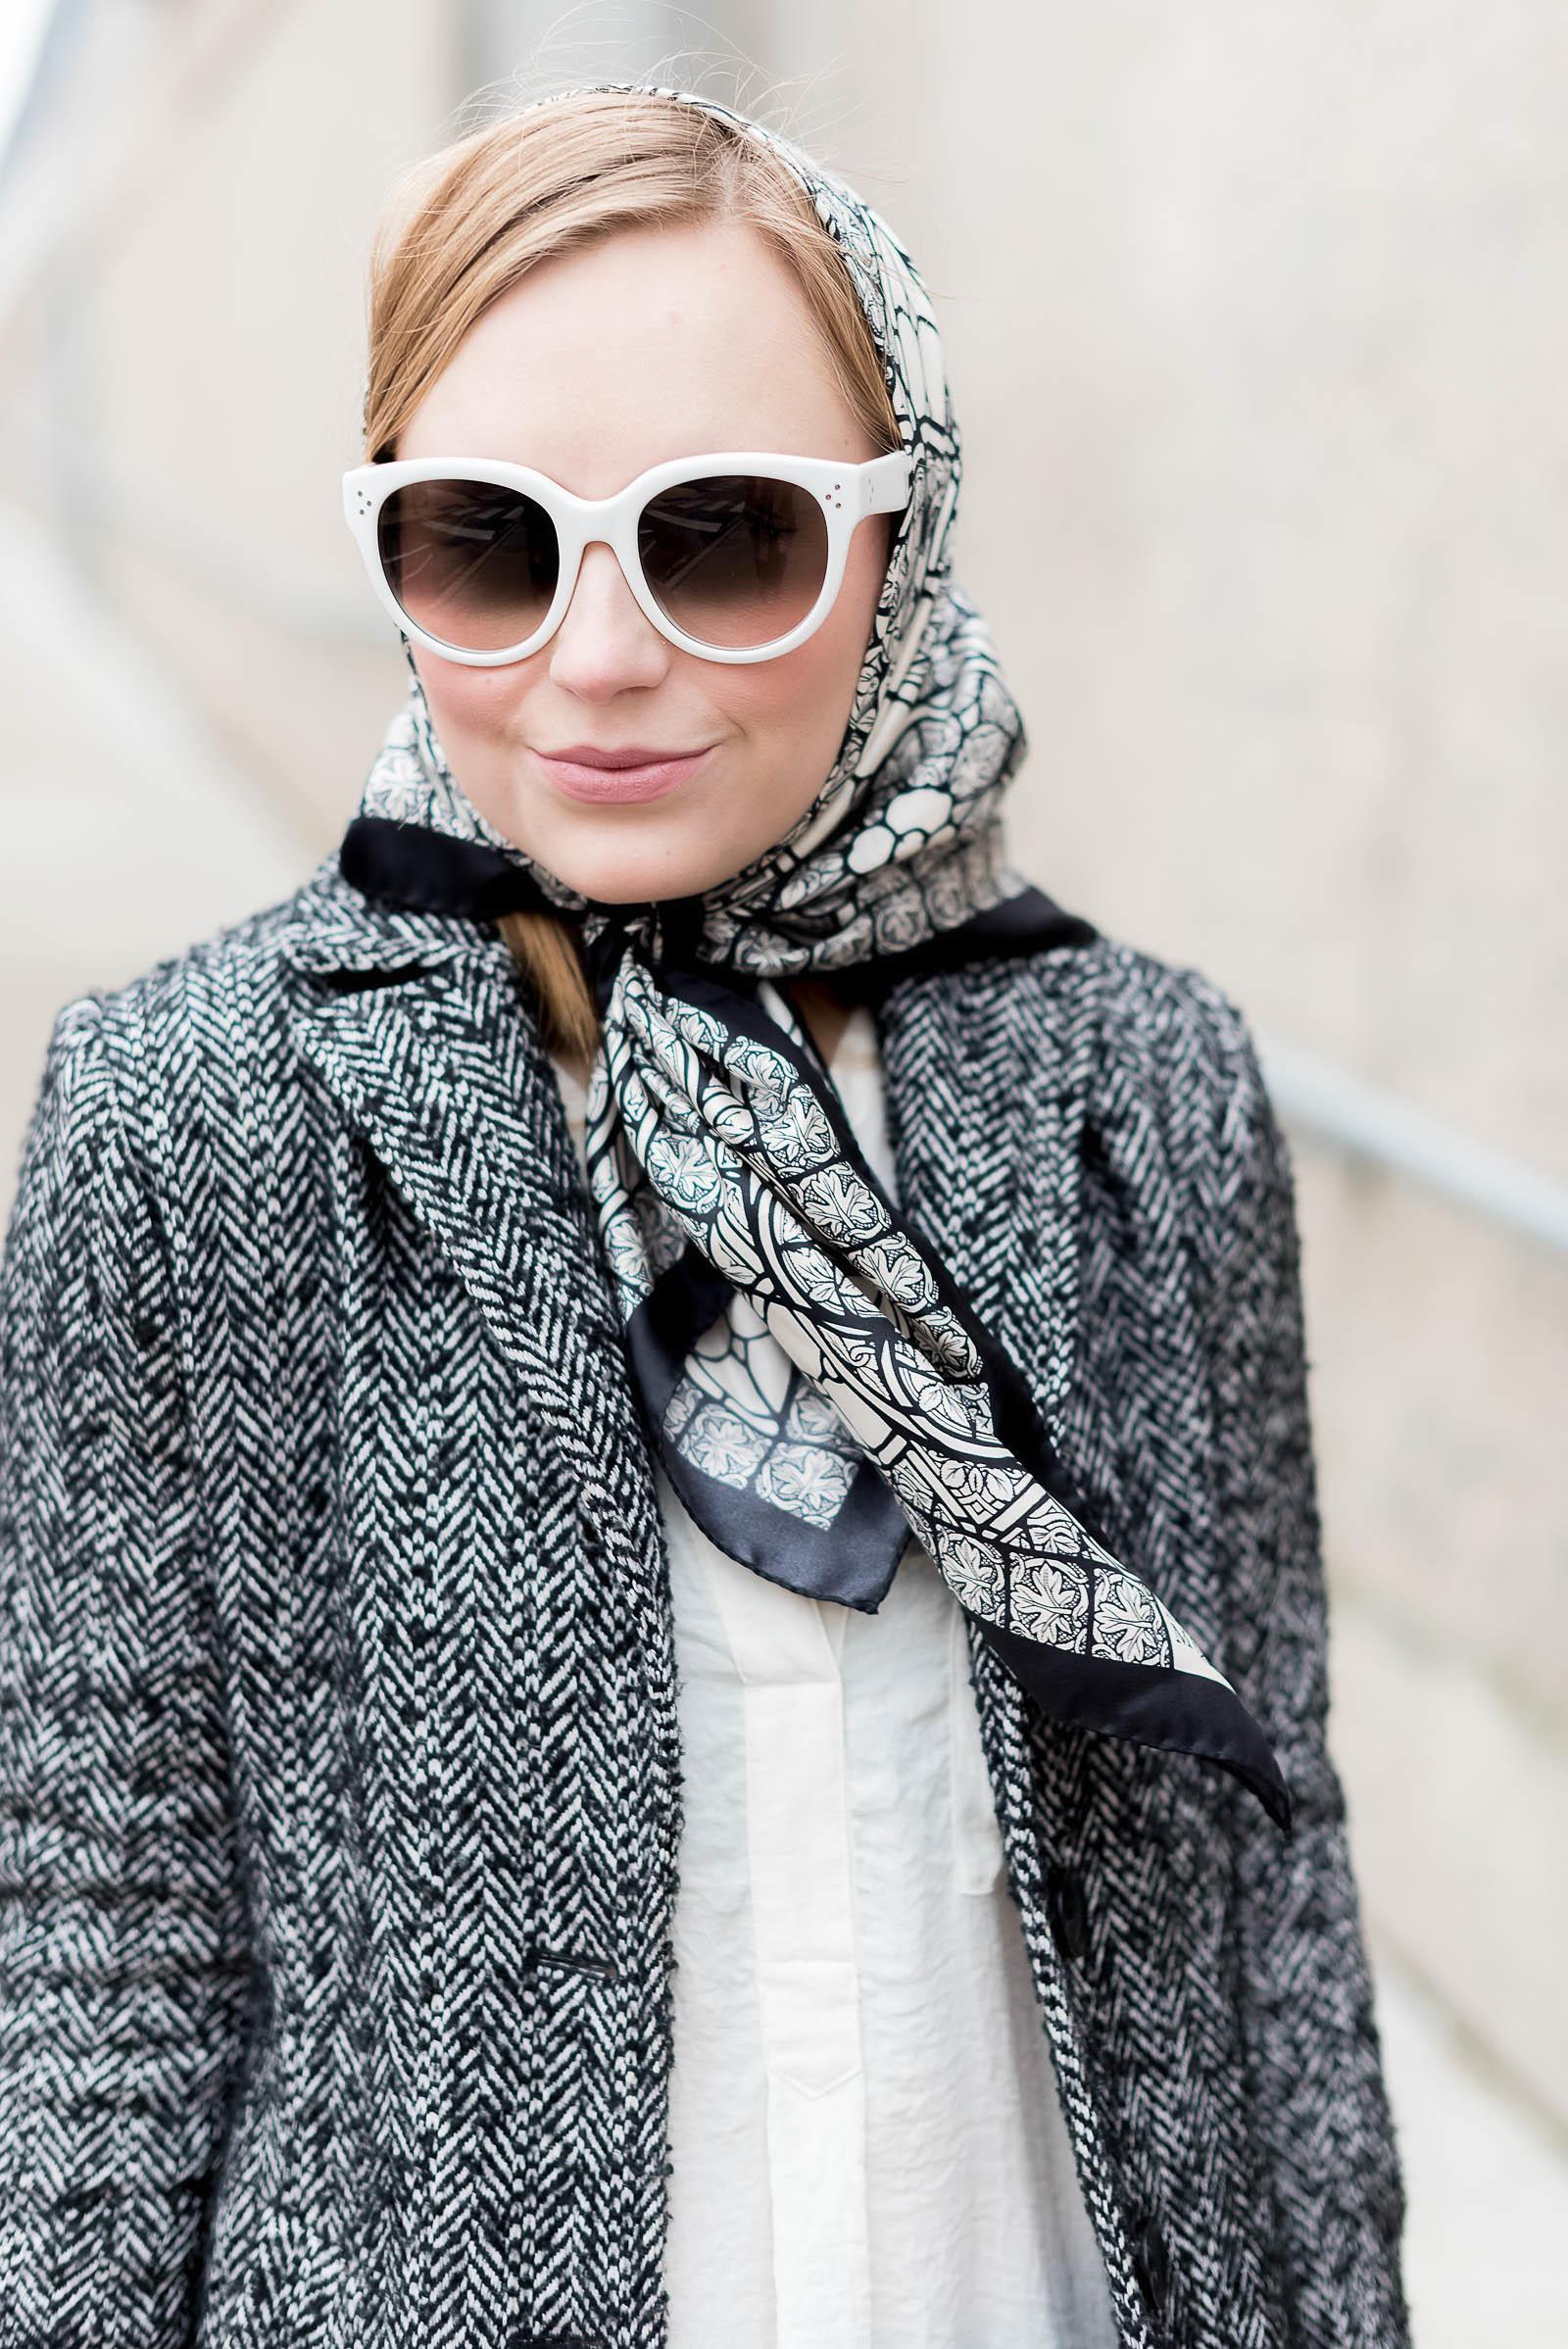 Alexander McQueen Victoria Beckham Céline Babushka Outfit